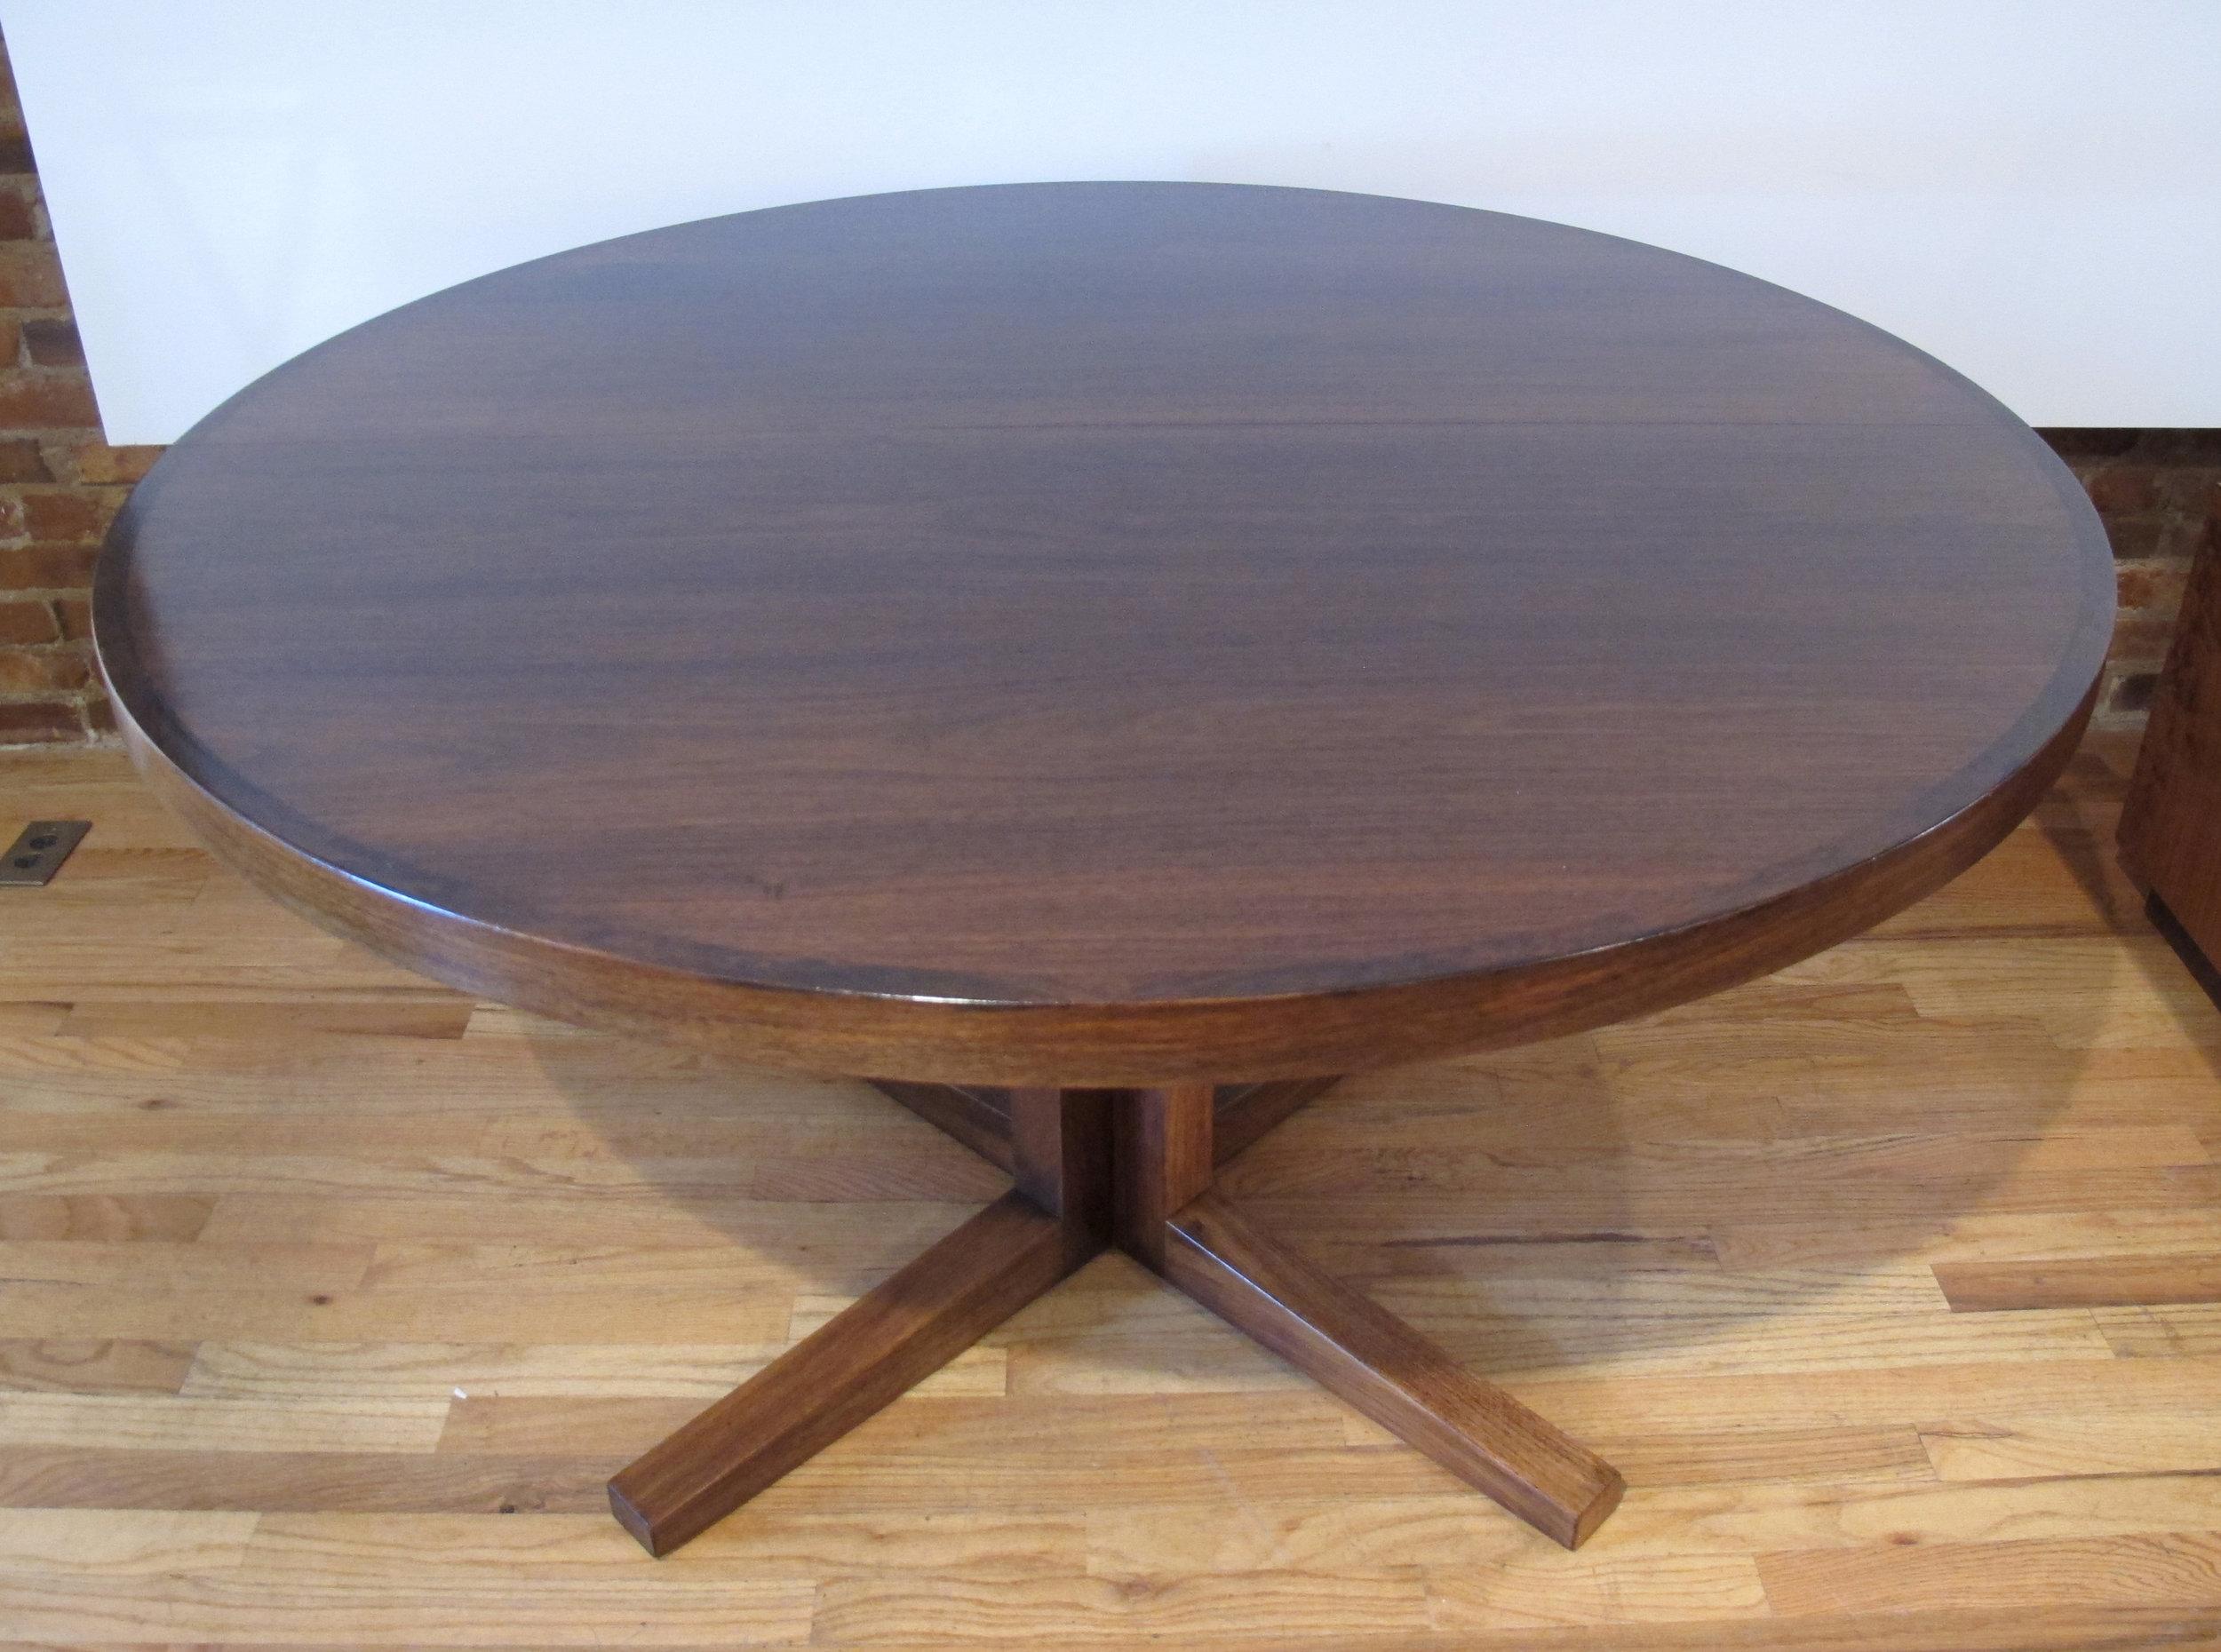 DANISH JOHN MORTENSEN ROSEWOOD ROUND DINING TABLE BY HELTBORG MOBLER